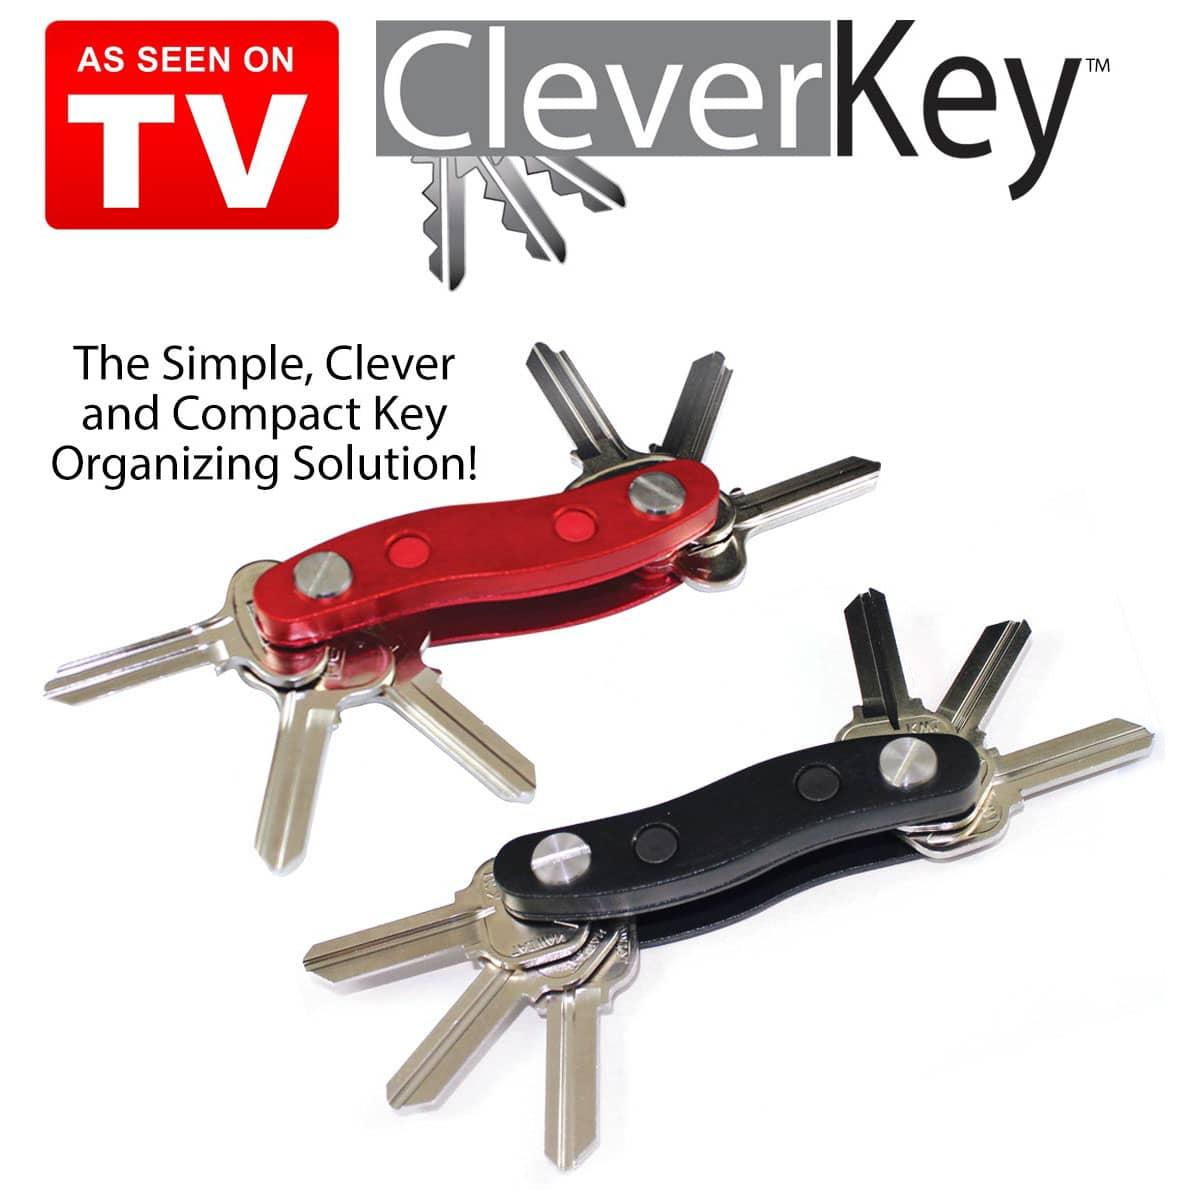 cleverkey-5